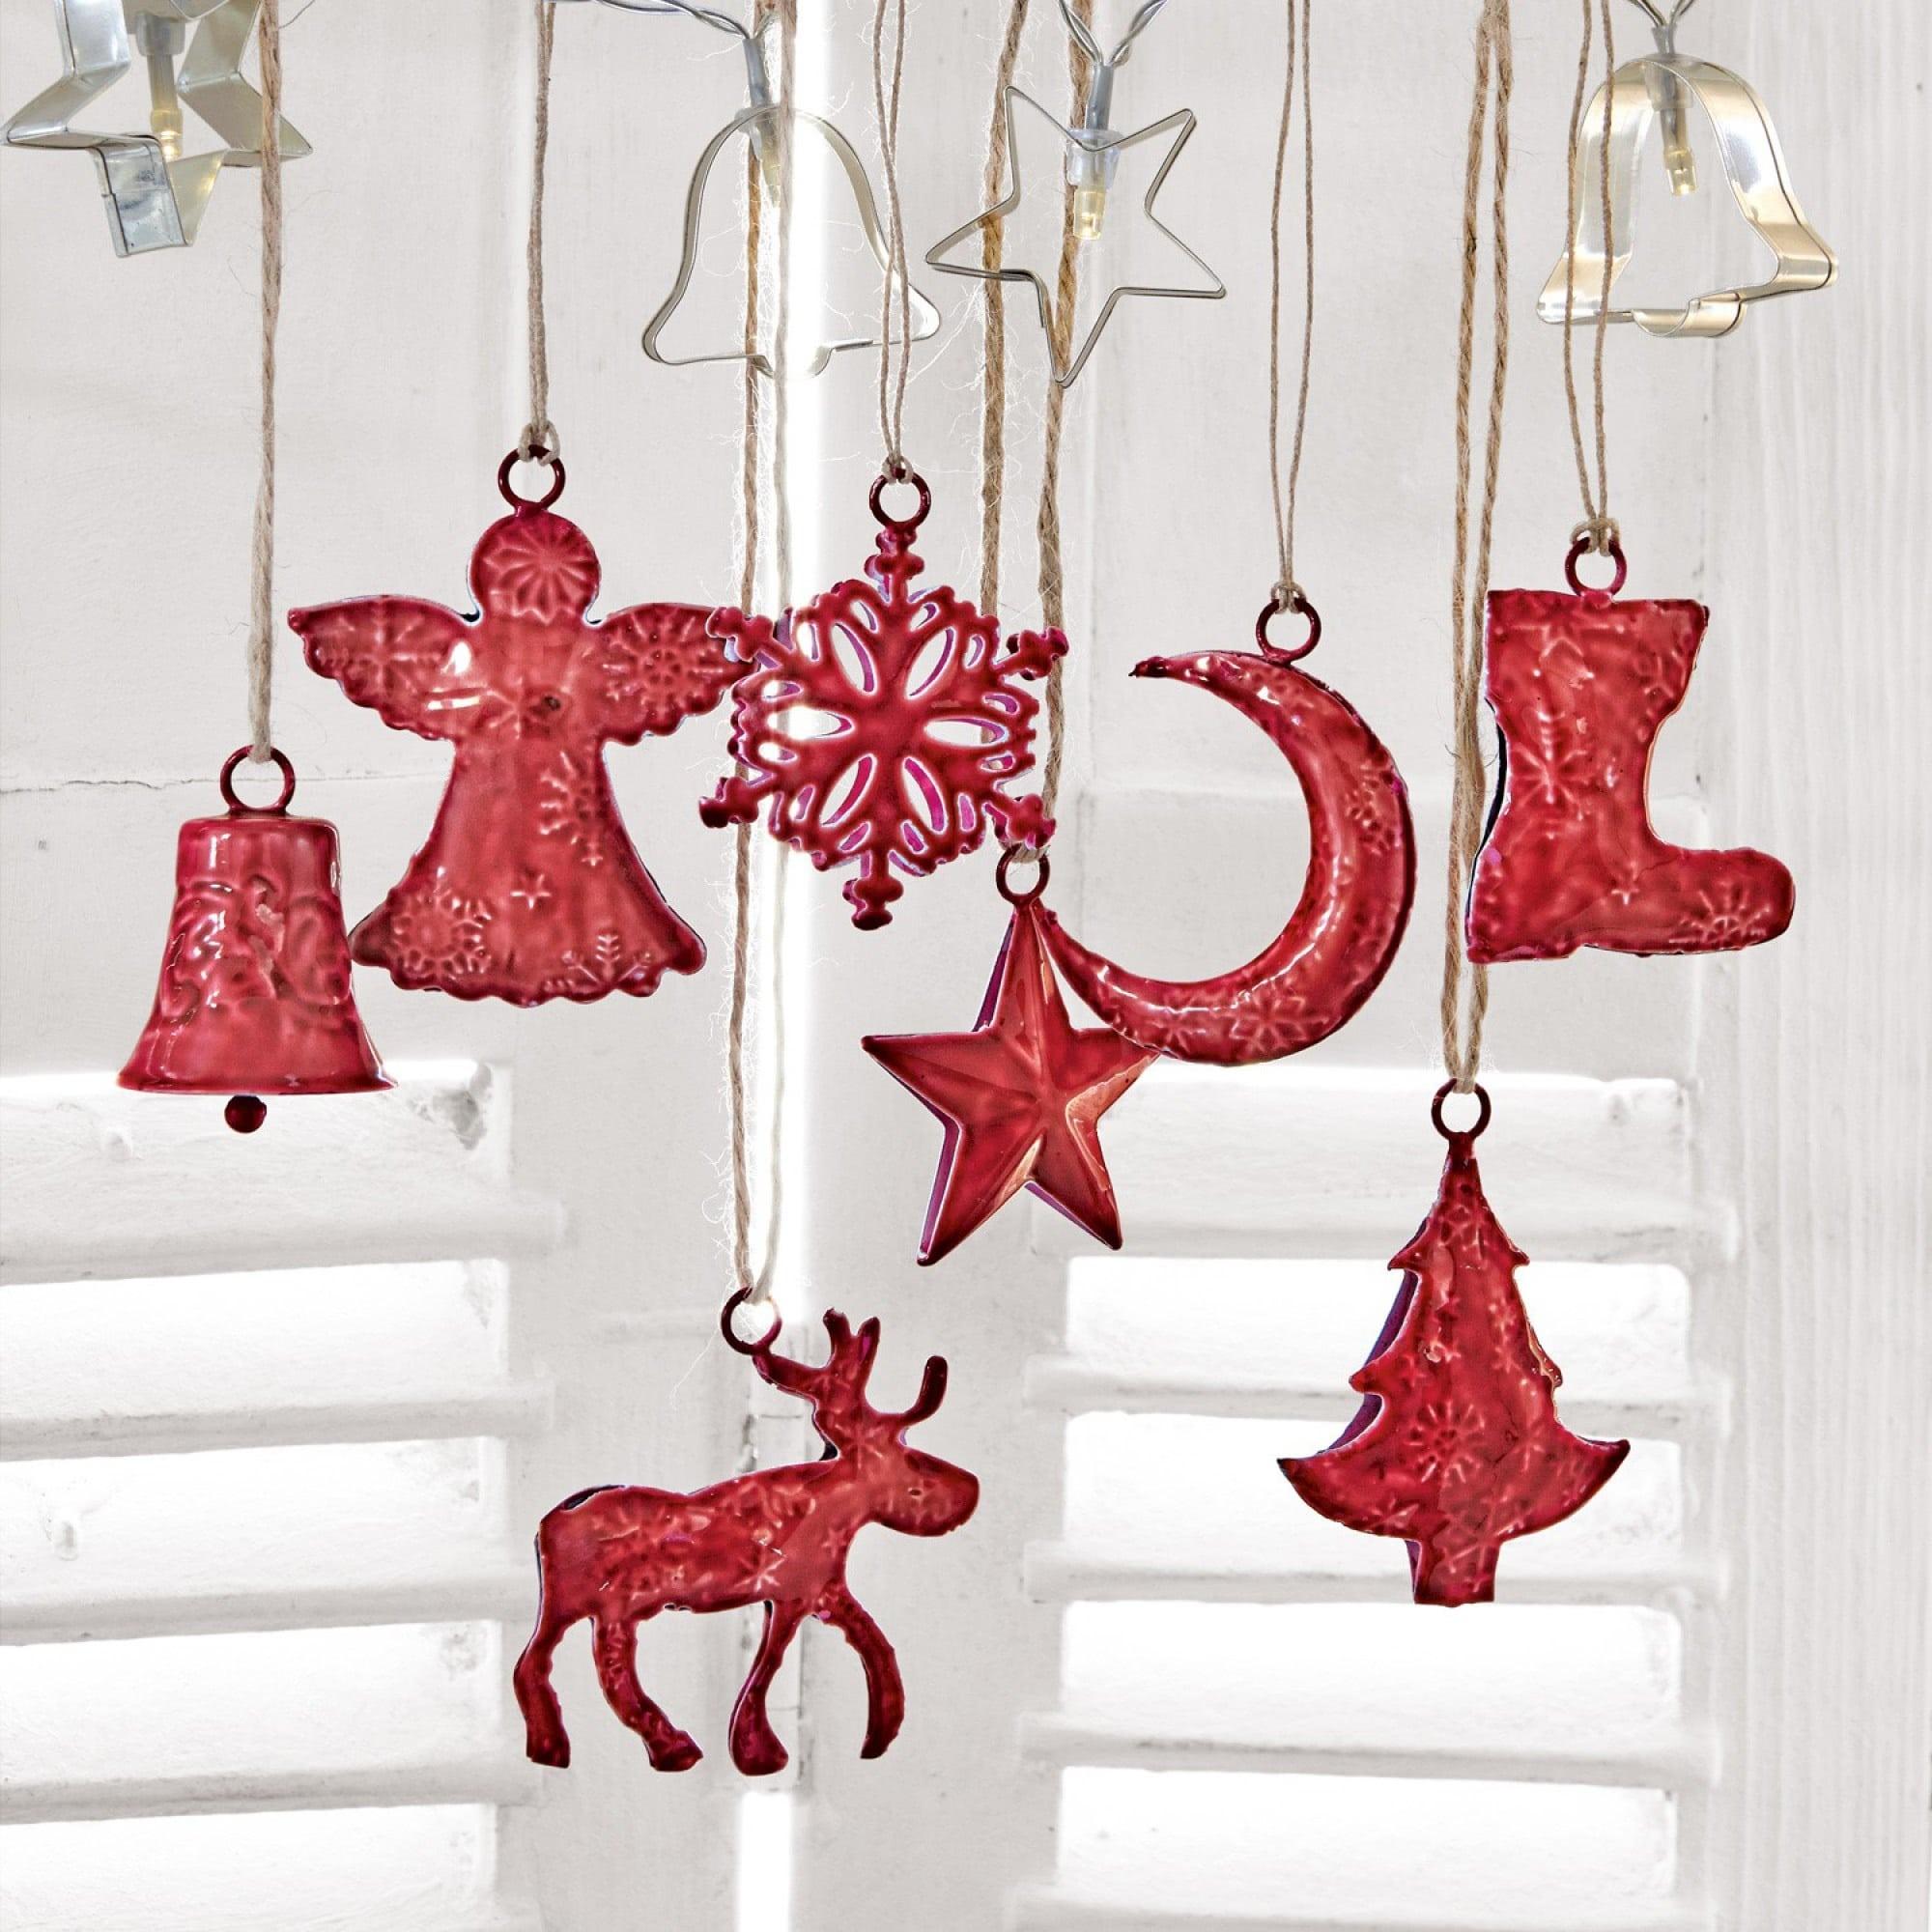 weihnachtsschmuck 8er set rudy co loberon coming home. Black Bedroom Furniture Sets. Home Design Ideas